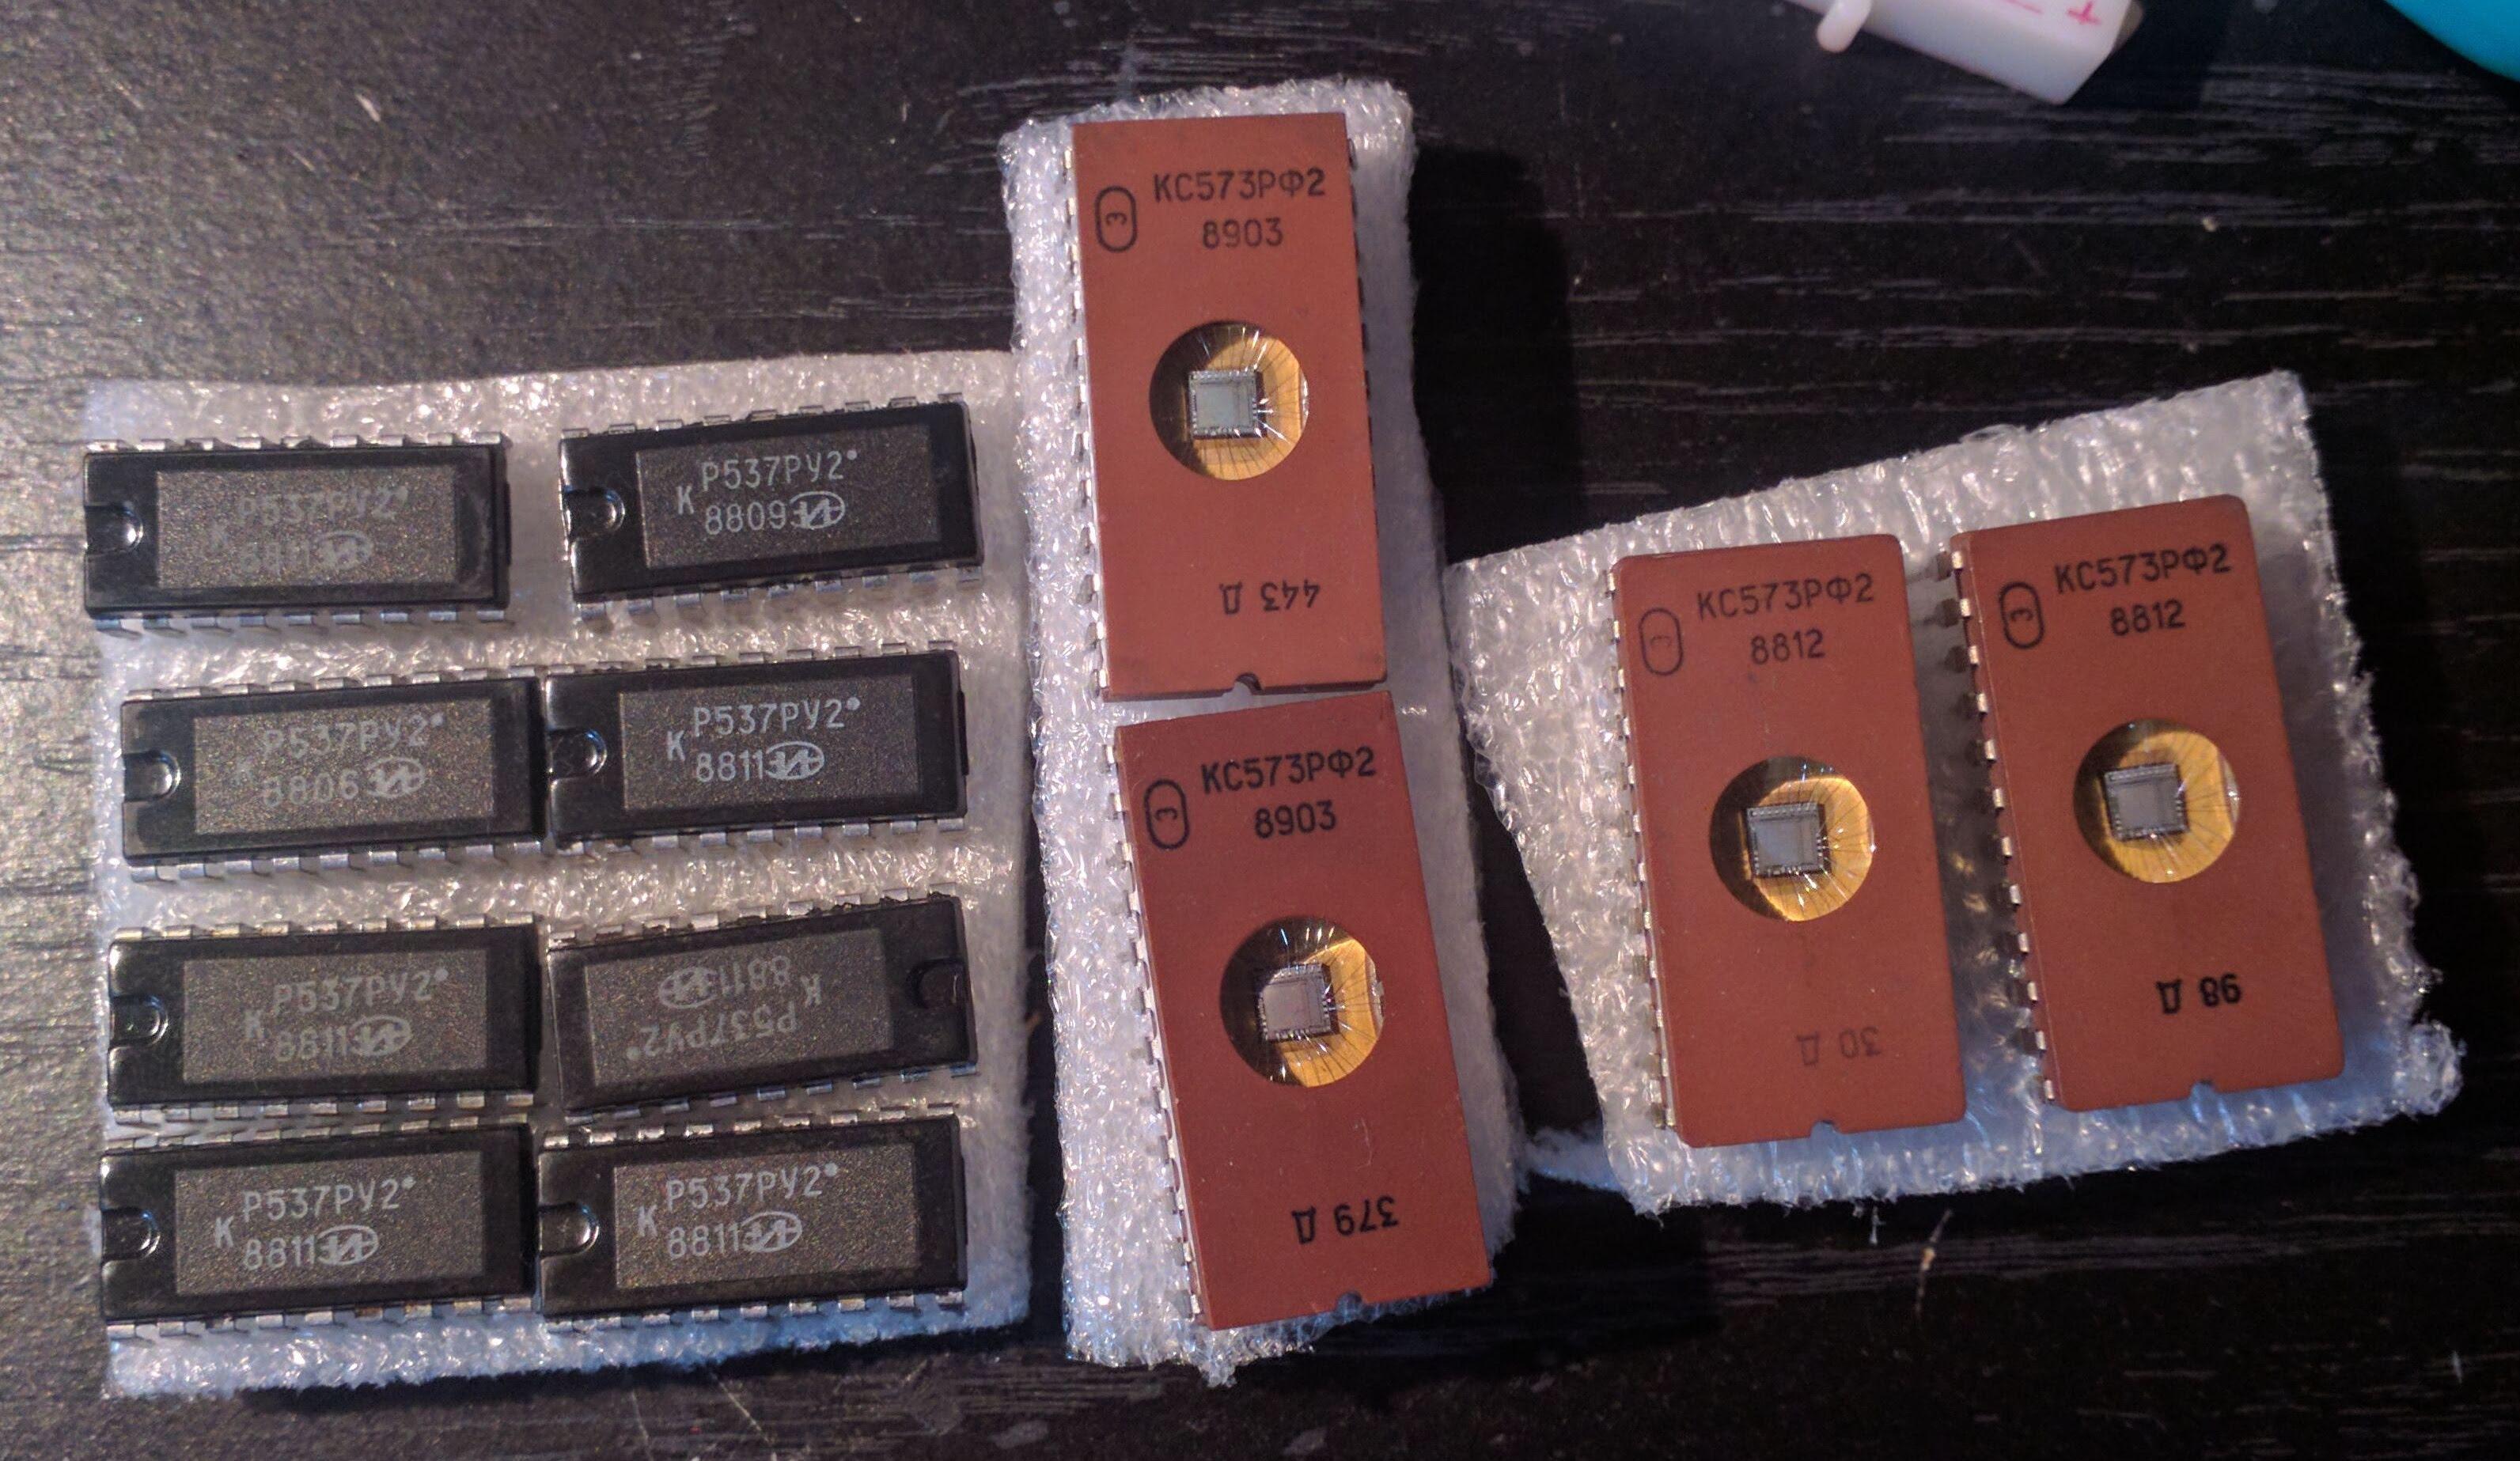 Soviet SRAM and EPROM chips